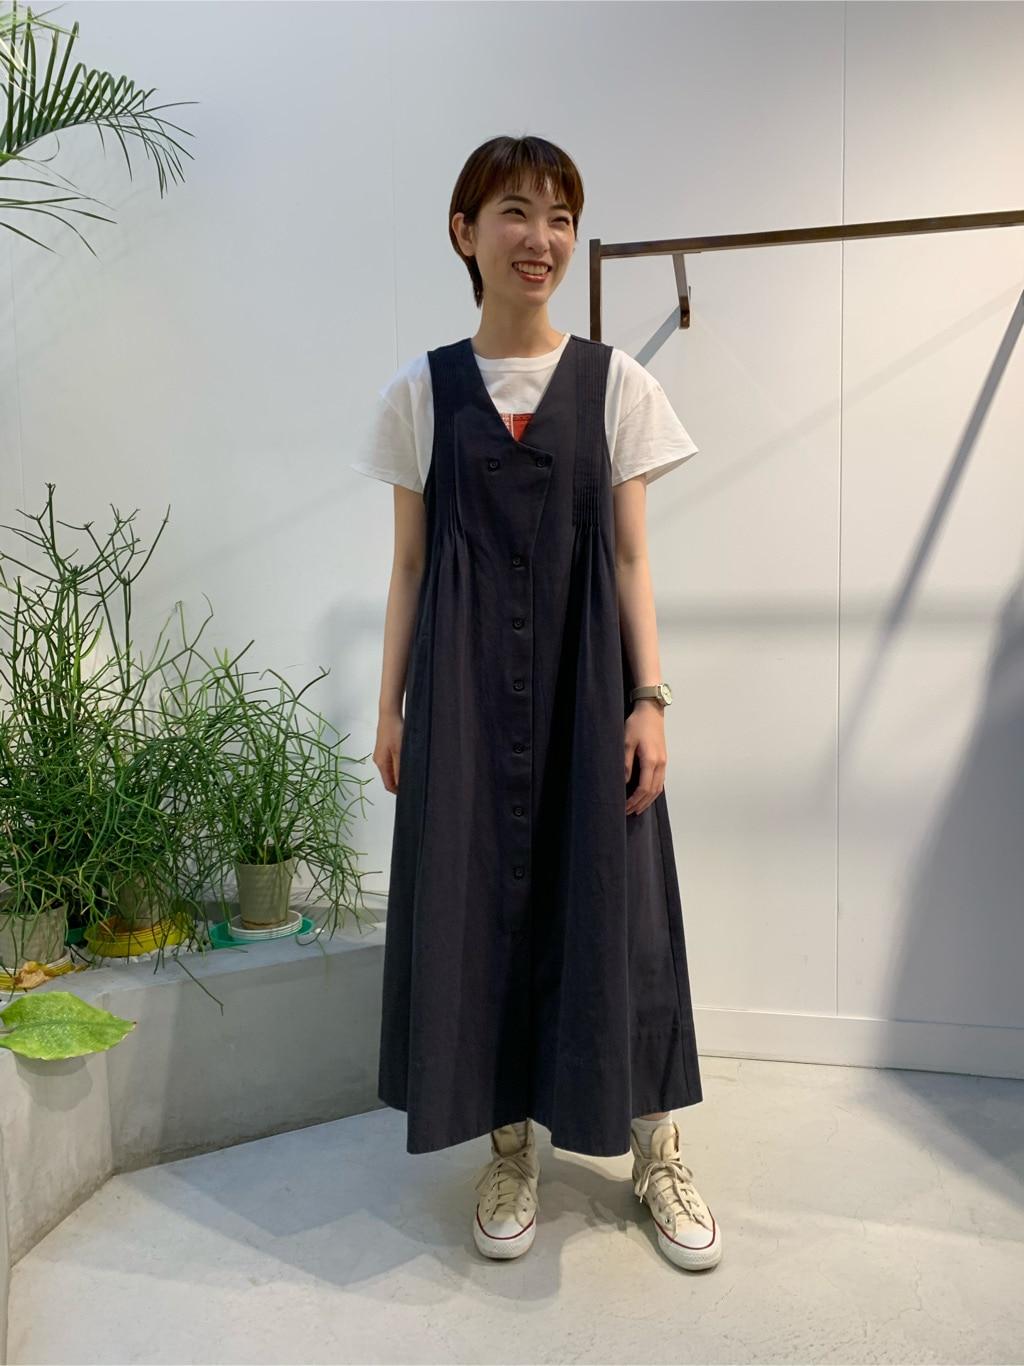 l'atelier du savon 名古屋栄路面 身長:161cm 2020.05.30